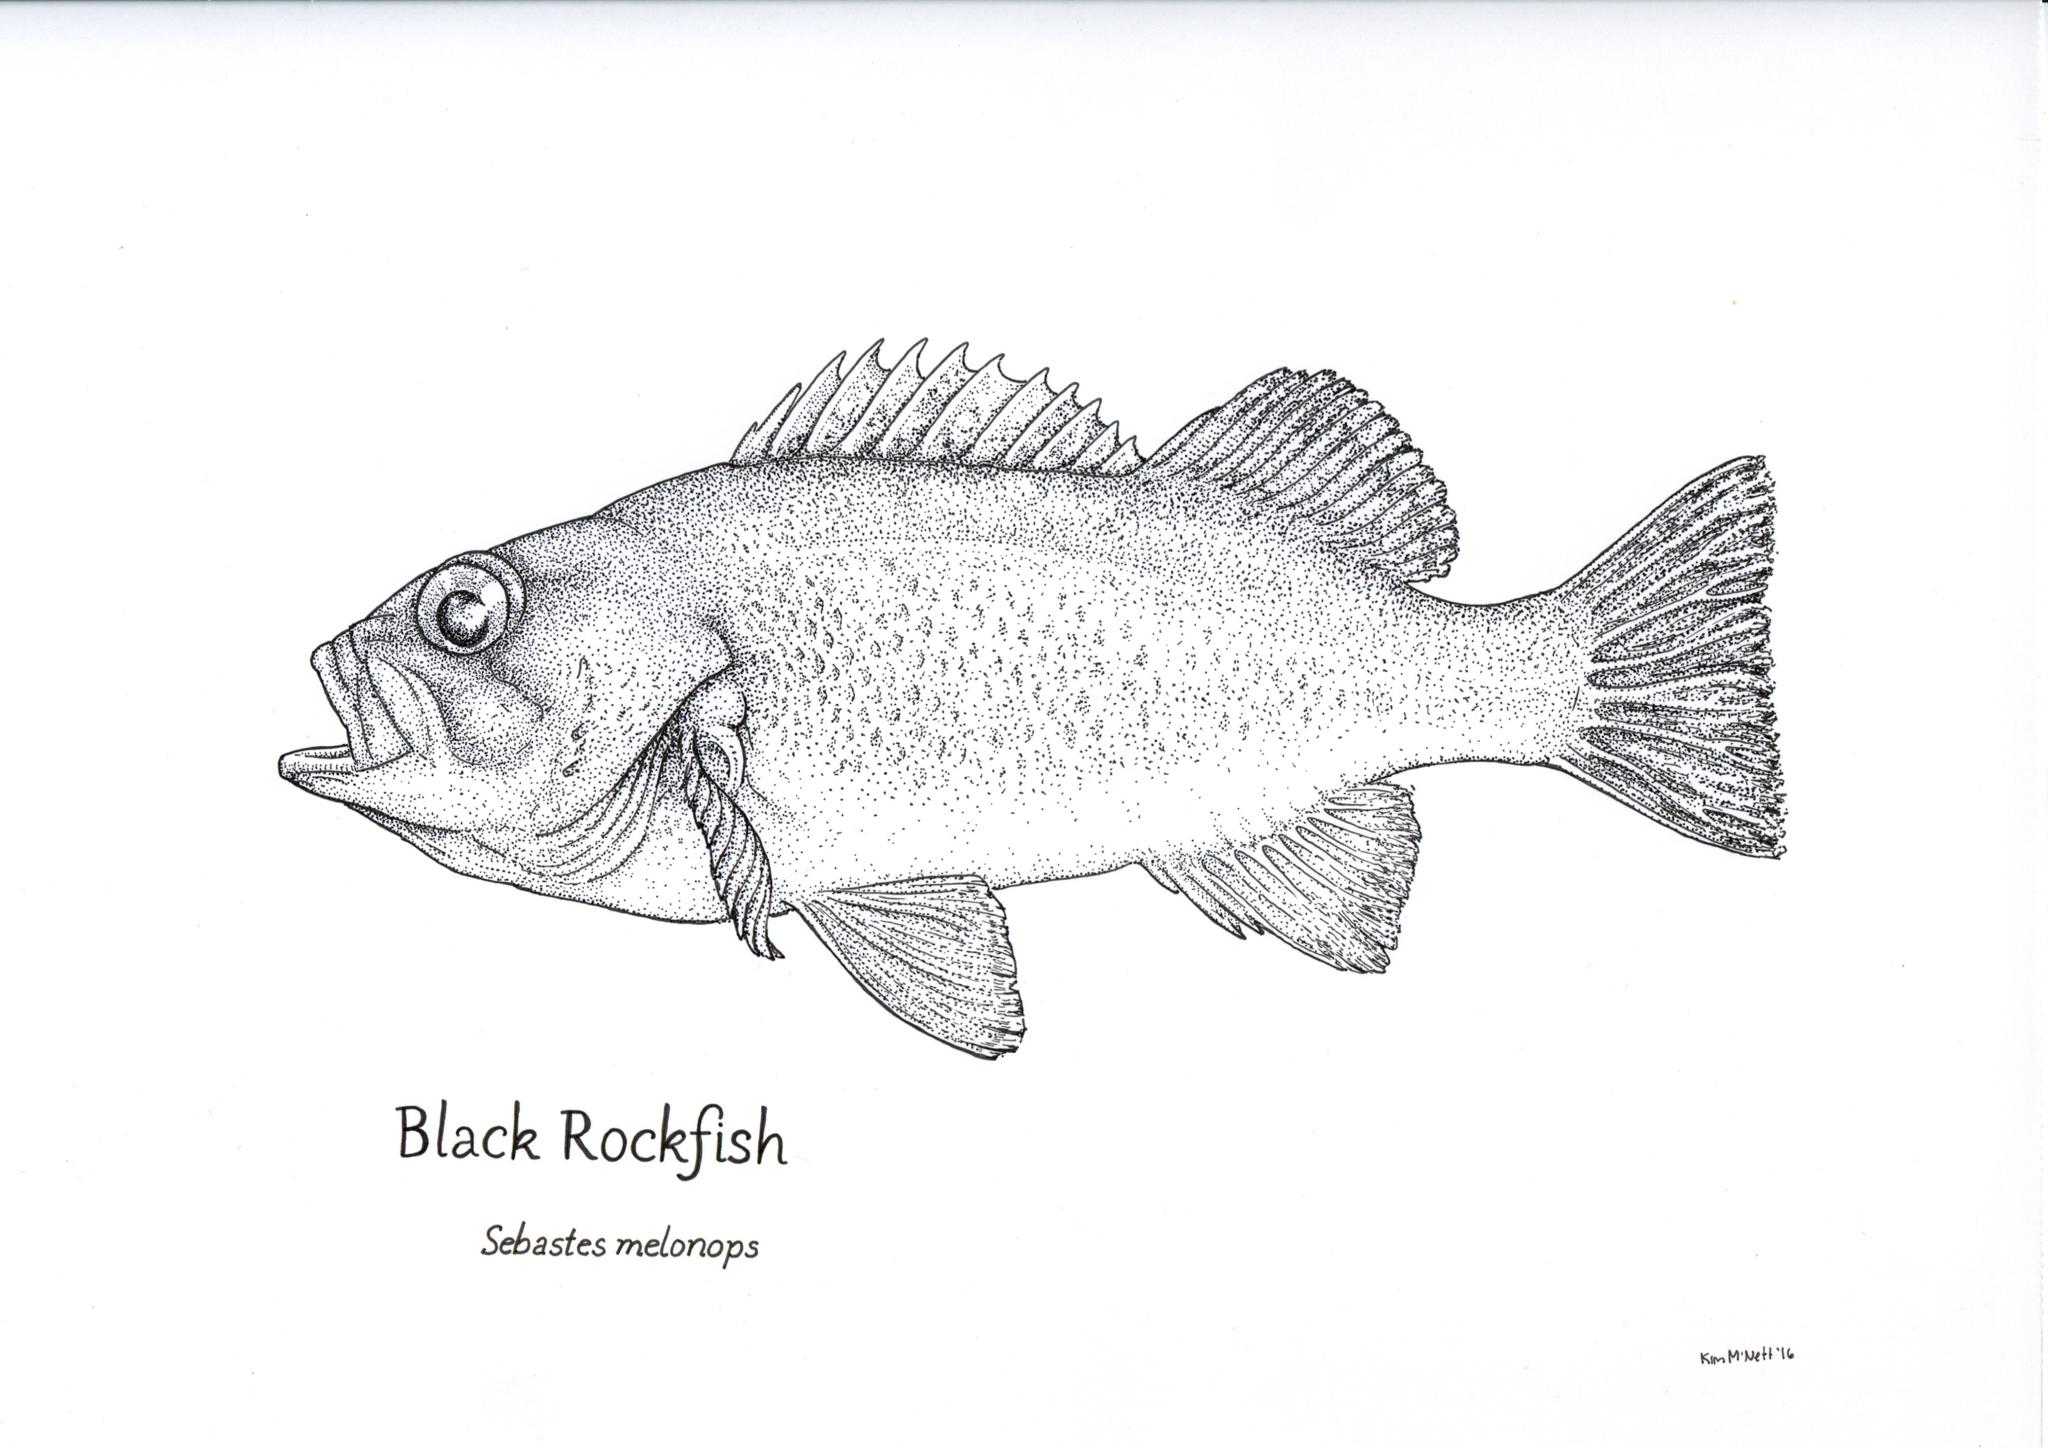 Black Rockfish Sebastes melanops drawing